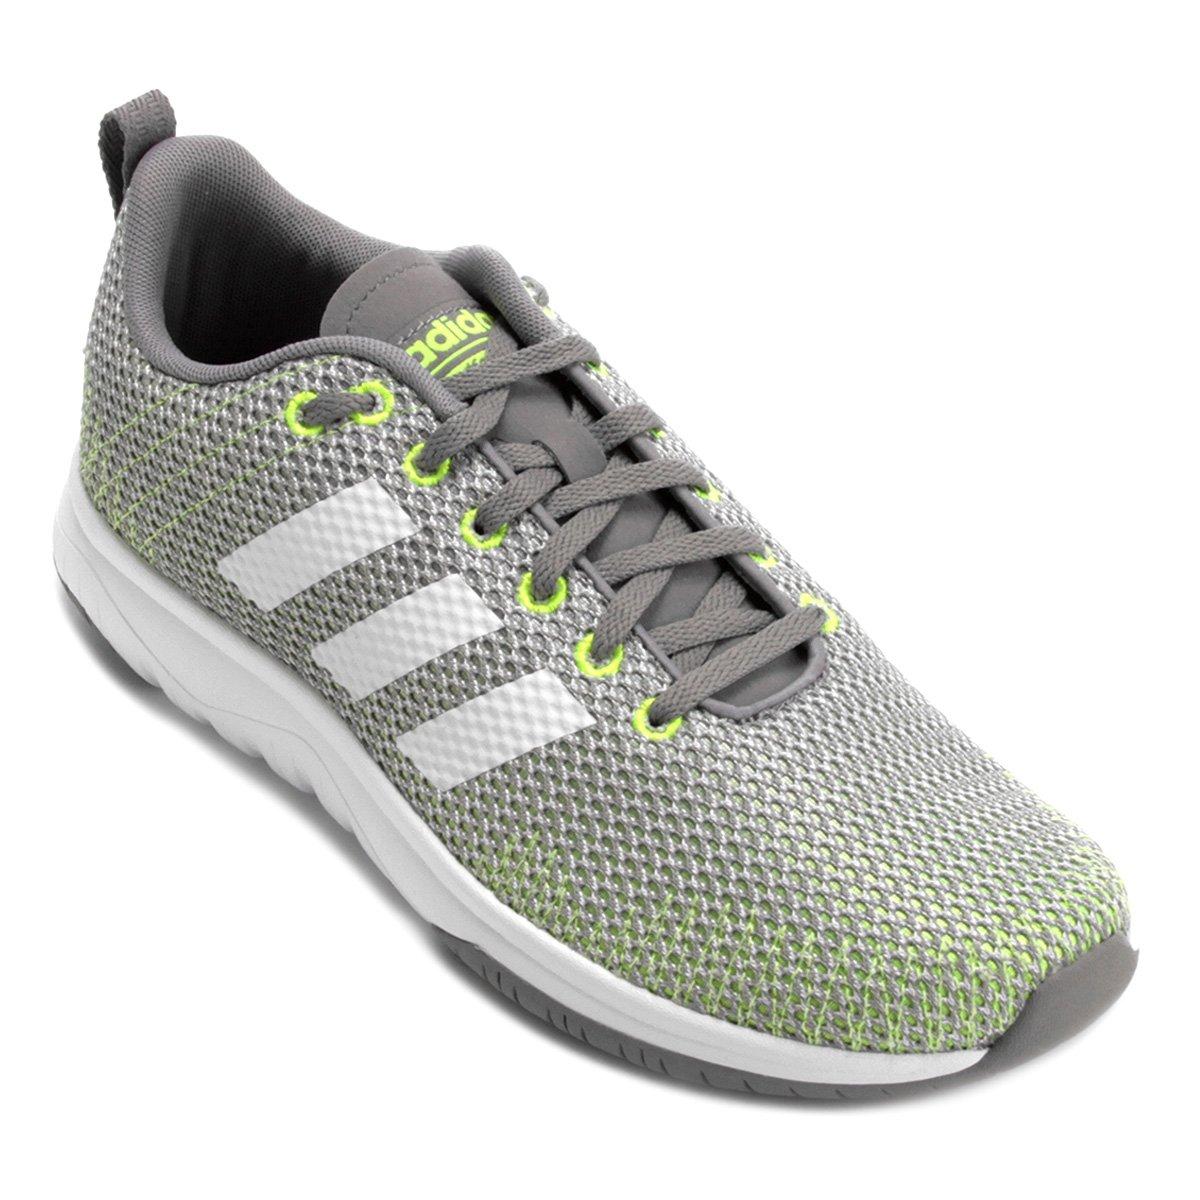 93683c7333 Tênis Adidas Cf Superflex Masculino - Compre Agora